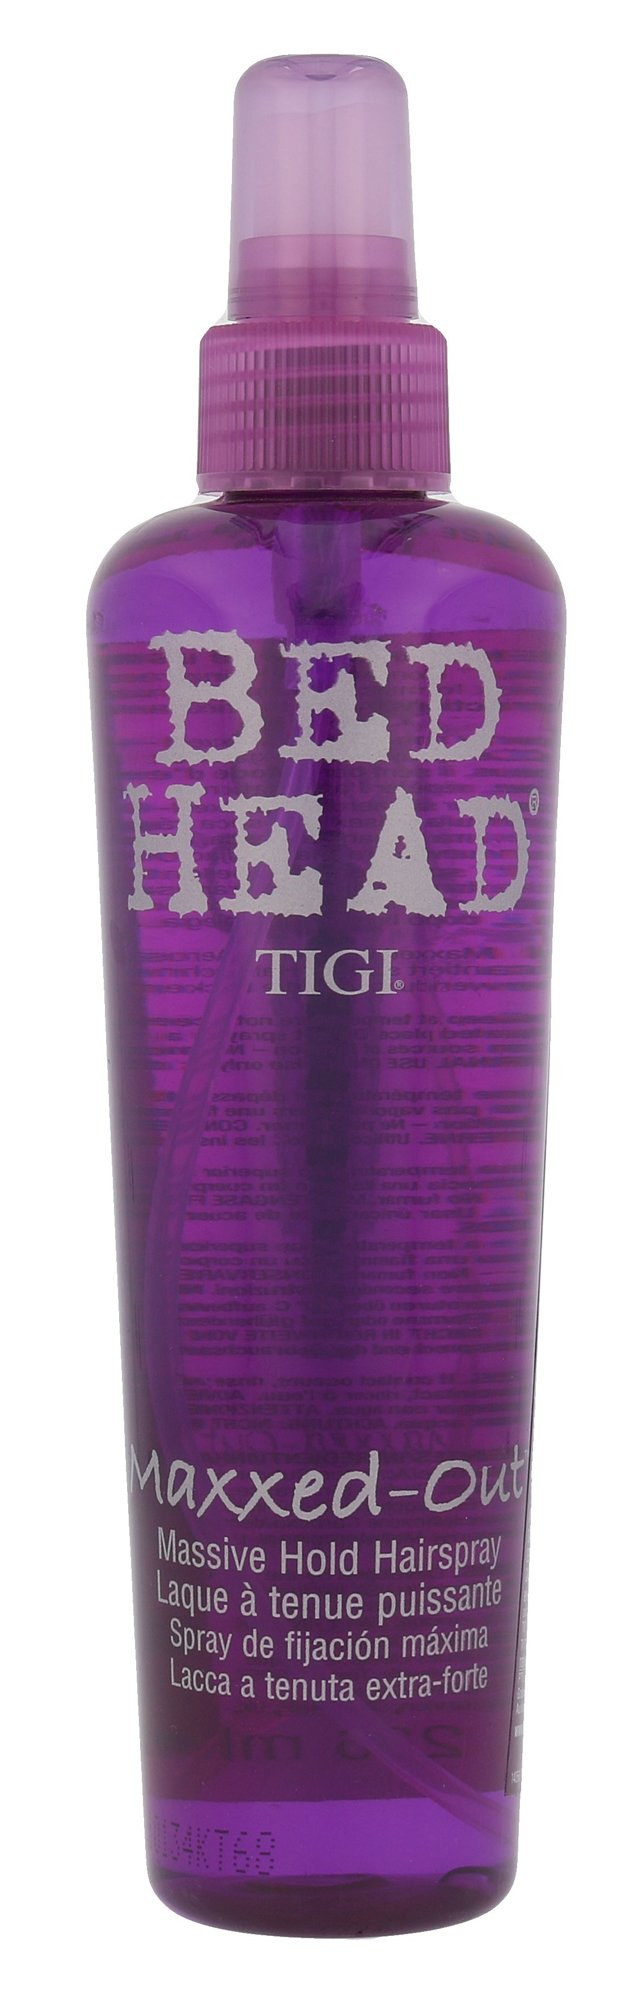 Plaukų formavimo priemonė Tigi Bed Head Maxxed Out